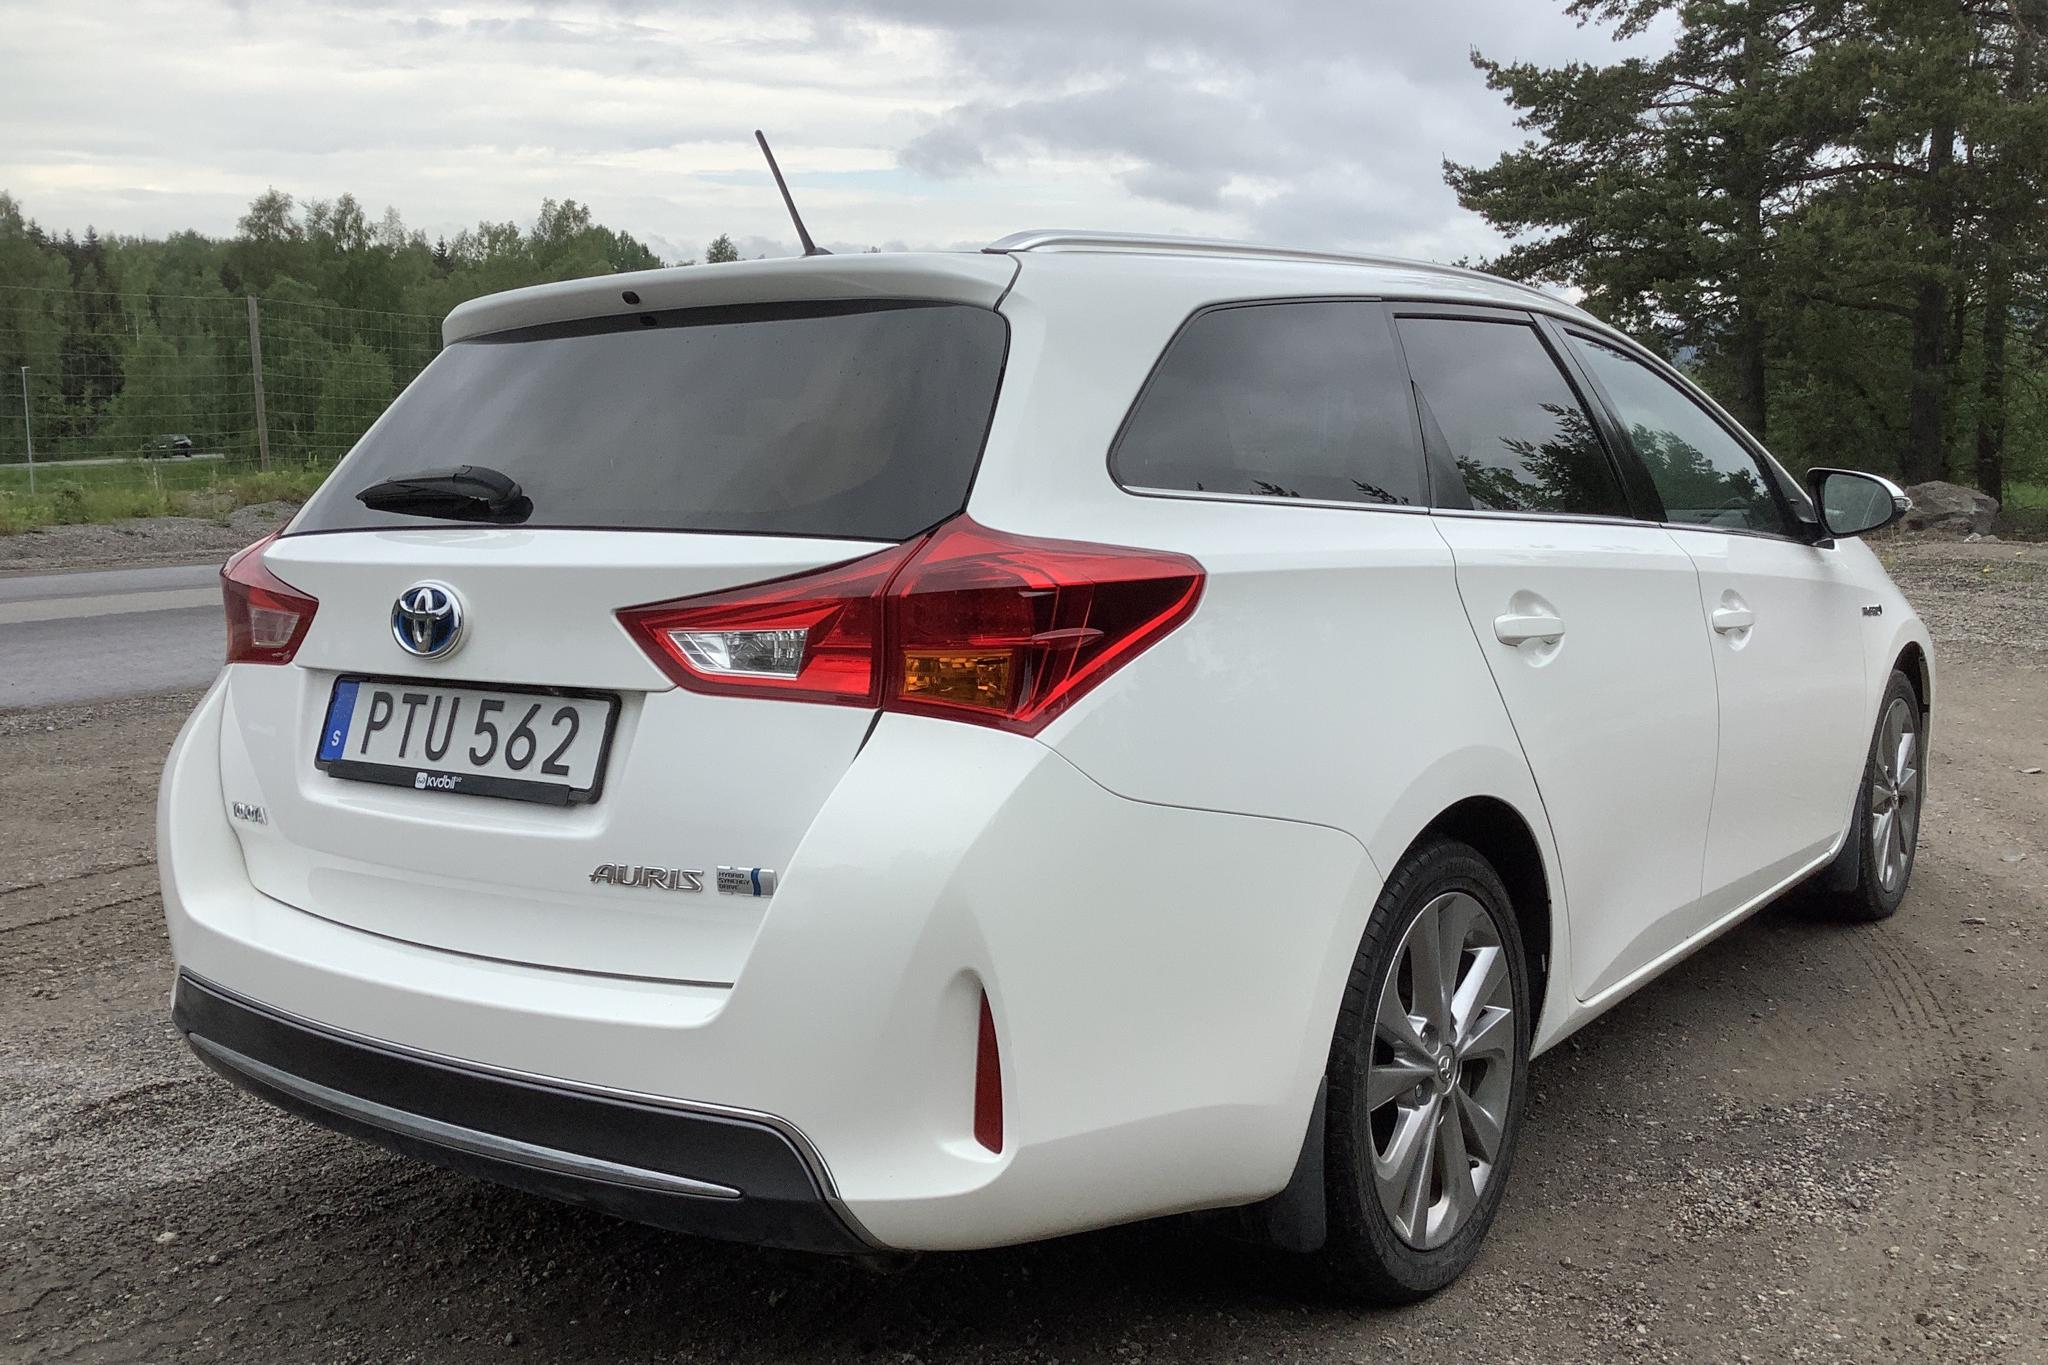 Toyota Auris 1.8 HSD Touring Sports (99hk) - 127 380 km - Automatic - white - 2014